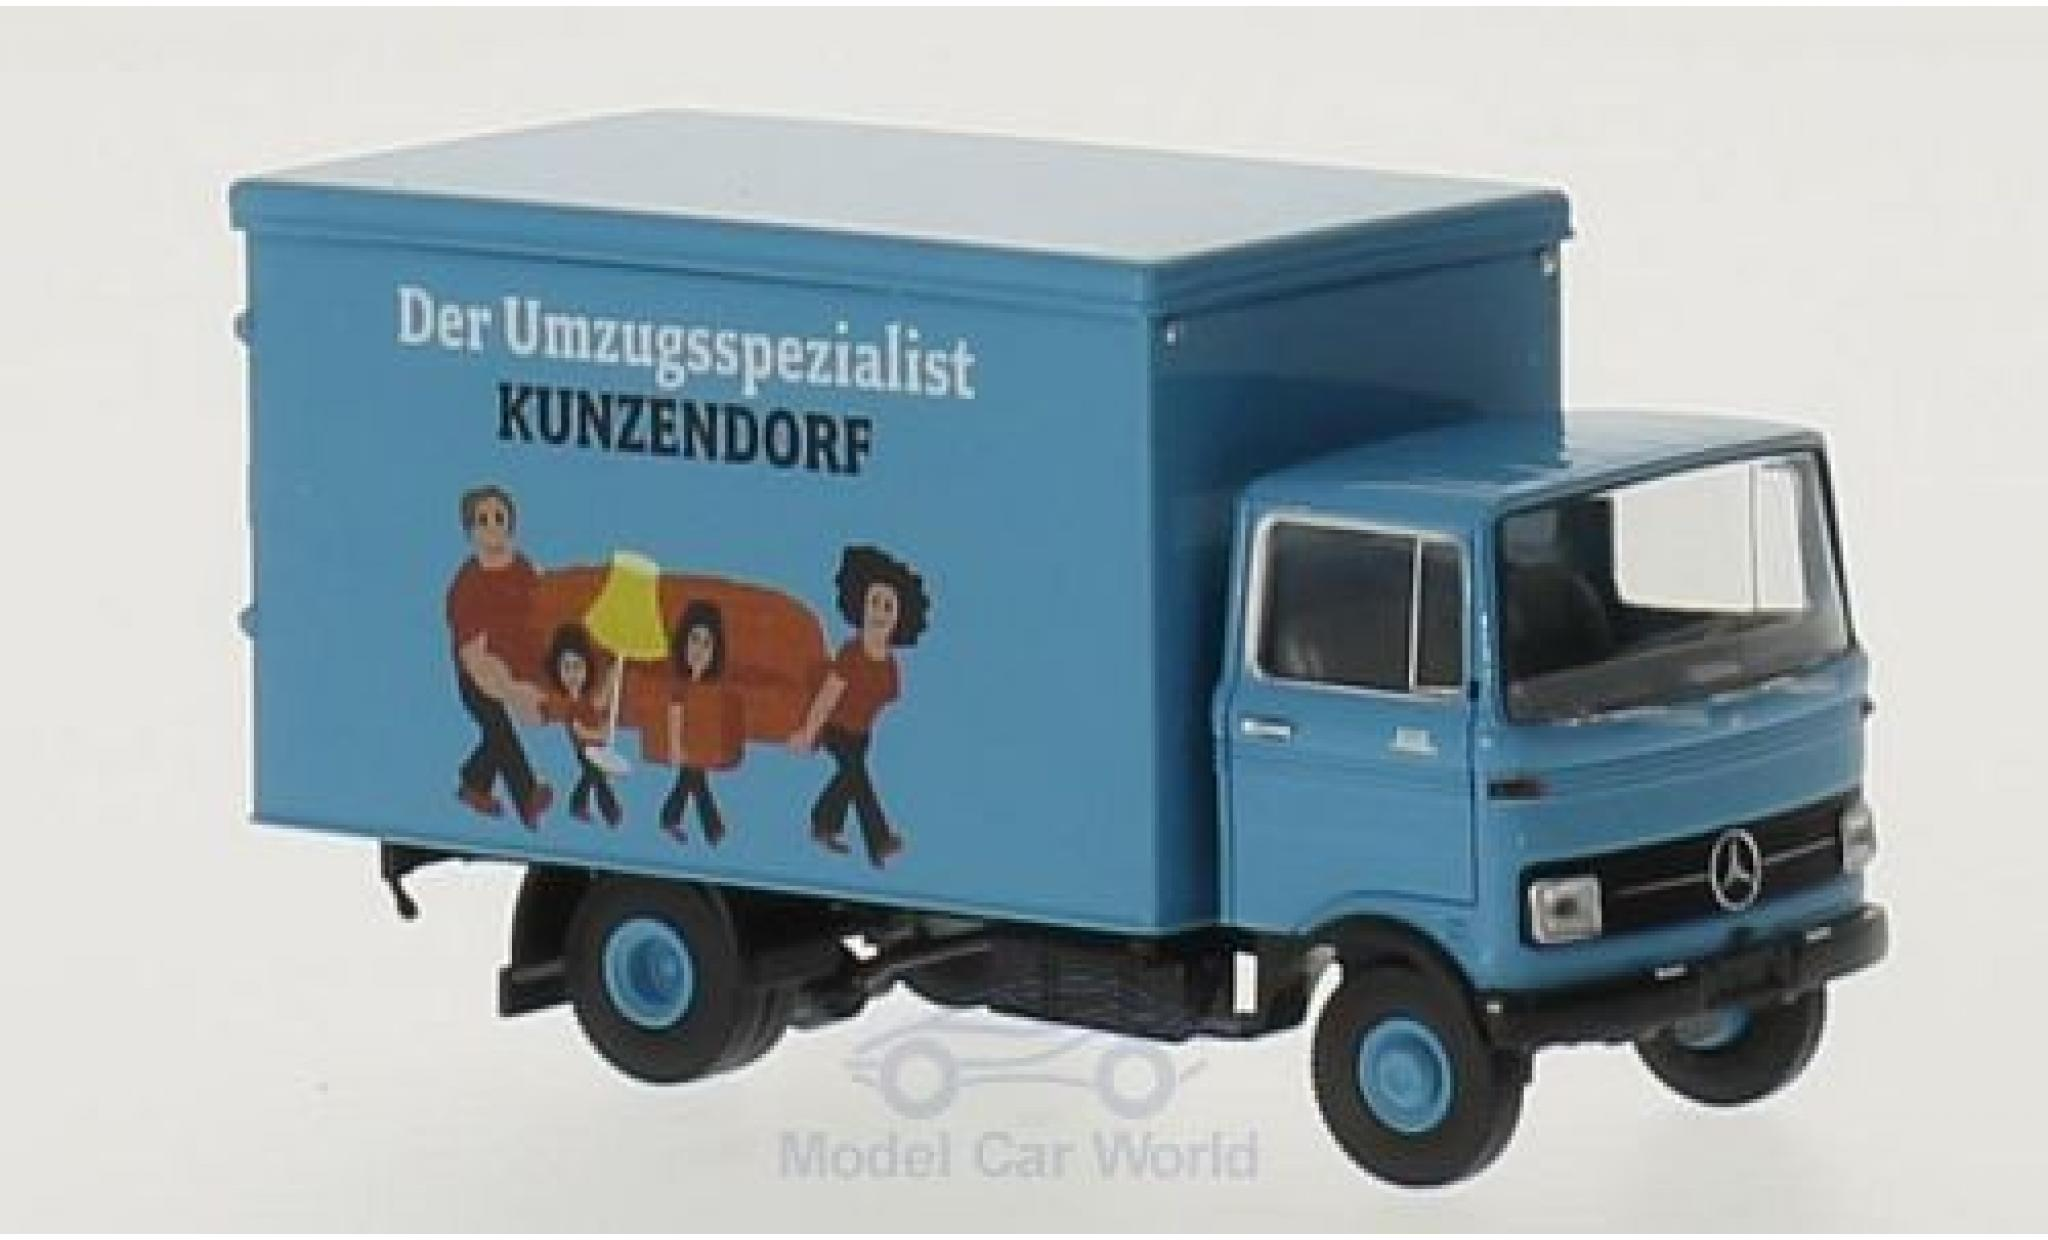 Mercedes LP 608 1/87 Brekina Koffer Kunzendorf